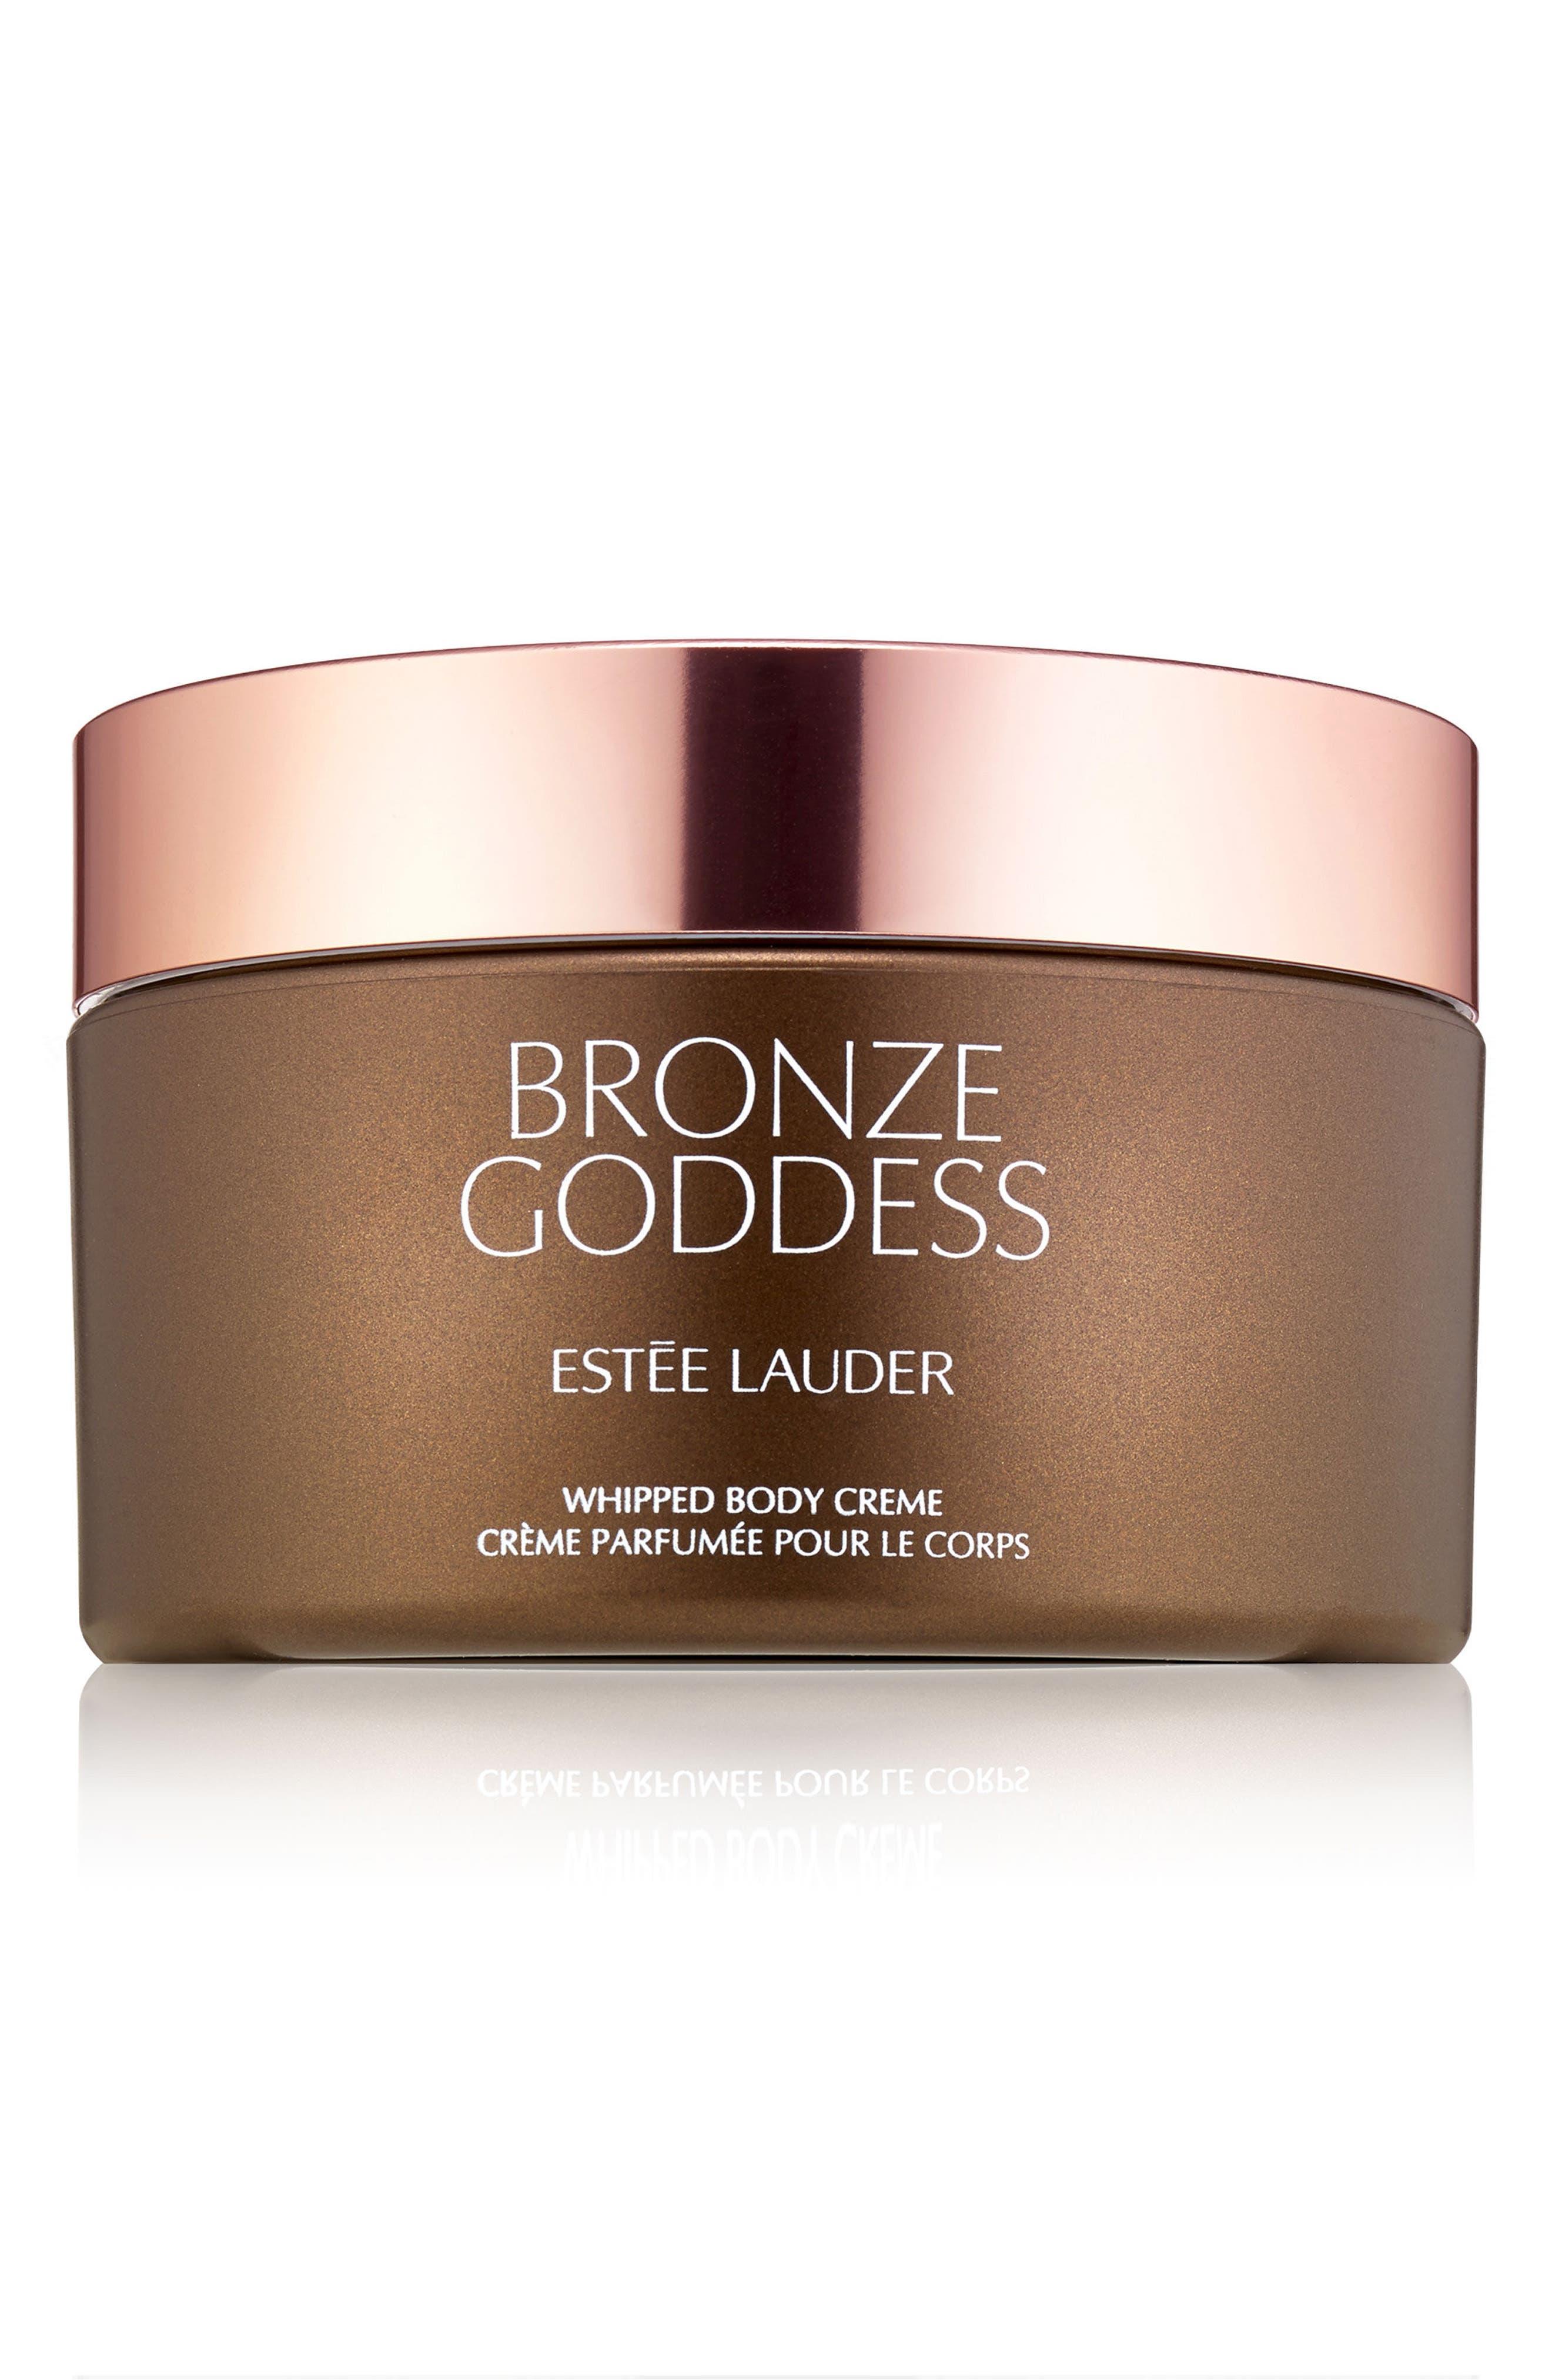 Bronze Goddess Whipped Body Crème,                             Main thumbnail 1, color,                             NO COLOR